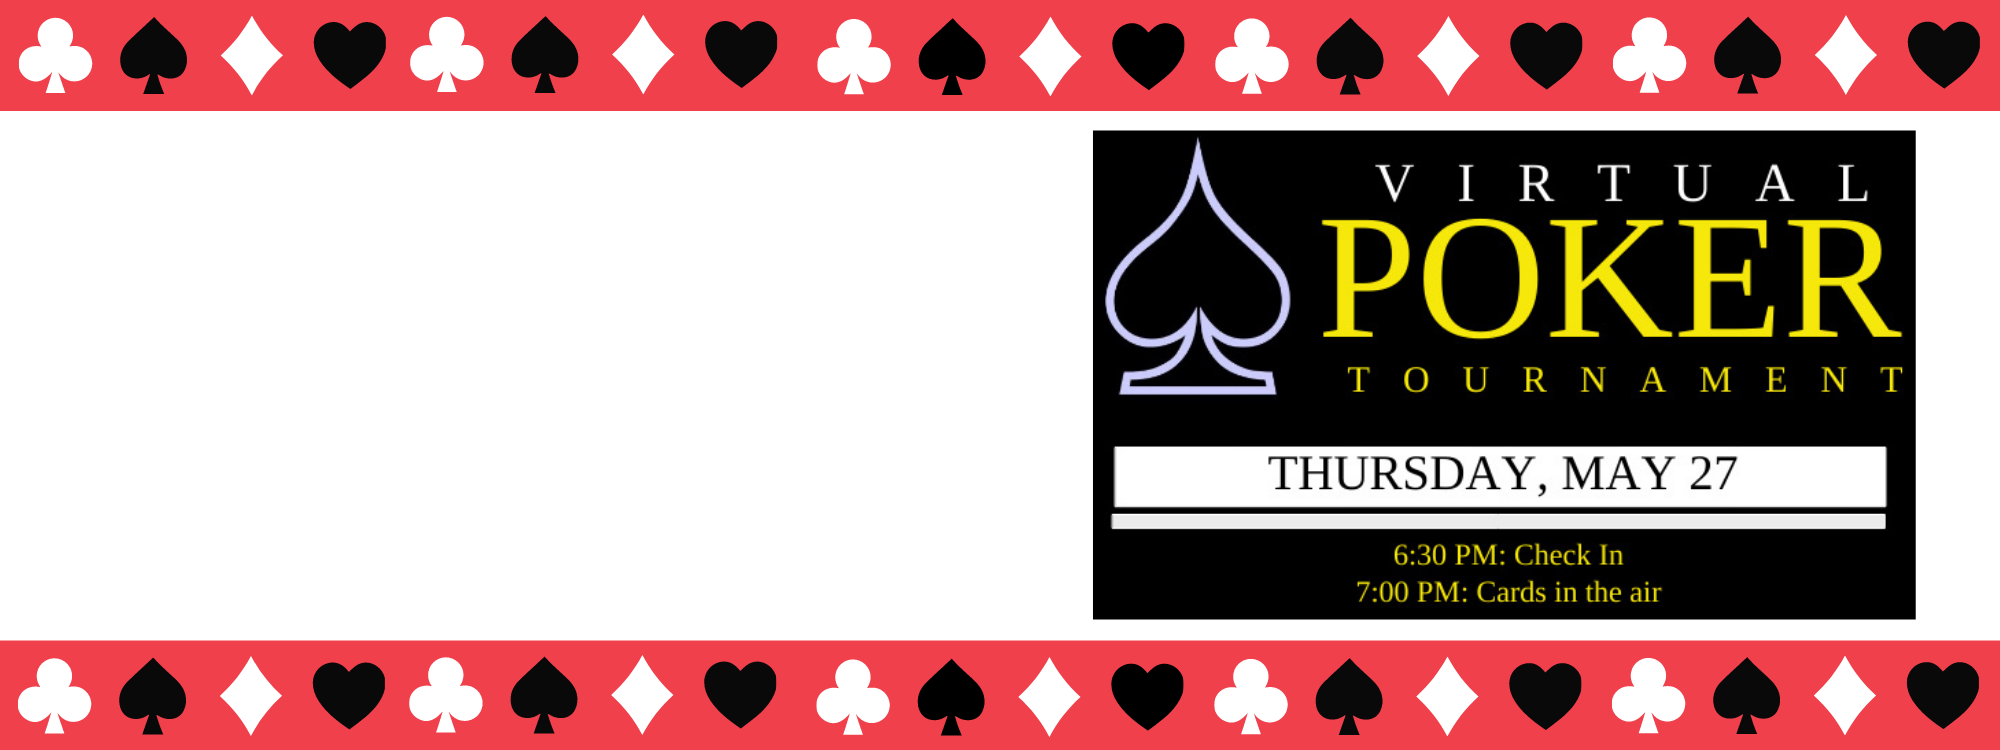 "<a href=""https://www.templebethemet.org/he-bros-mens-club""                                     target=""_blank"">                                                                 <span class=""slider_title"">                                     Virtual Poker Tournament                                </span>                                                                 </a>                                                                                                                                                                                      <a href=""https://www.templebethemet.org/he-bros-mens-club"" class=""slider_link""                             target=""_blank"">                             More Details                            </a>"